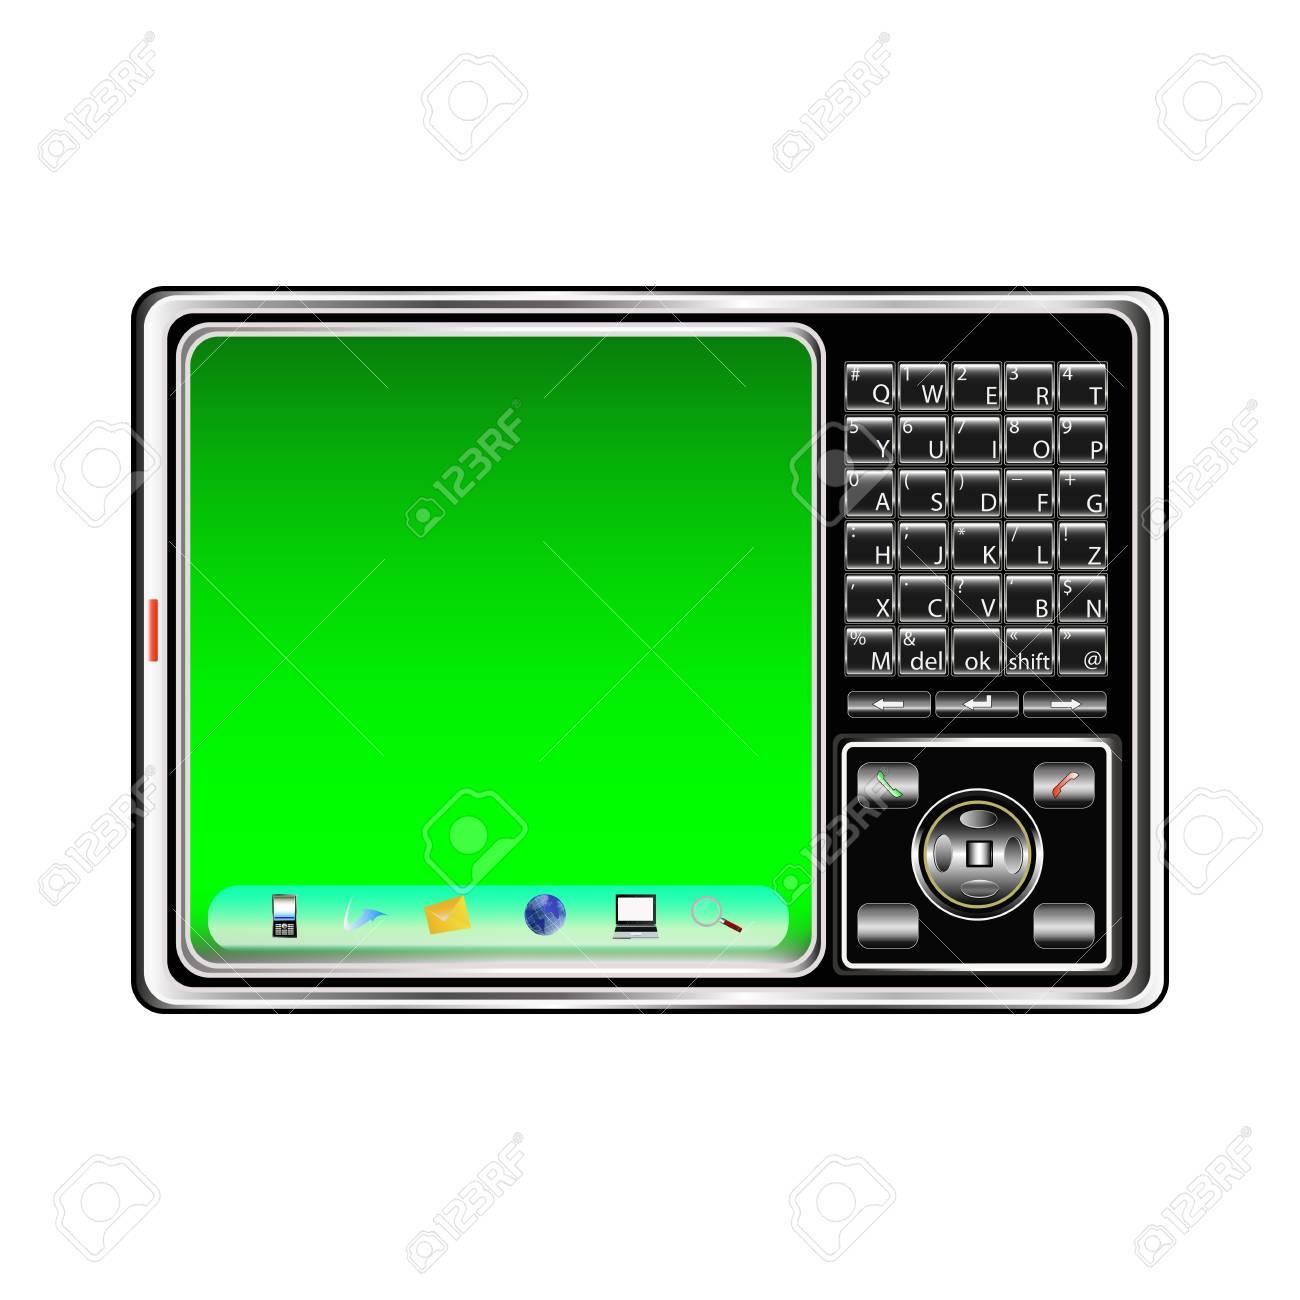 Mobile phone Stock Photo - 9391887